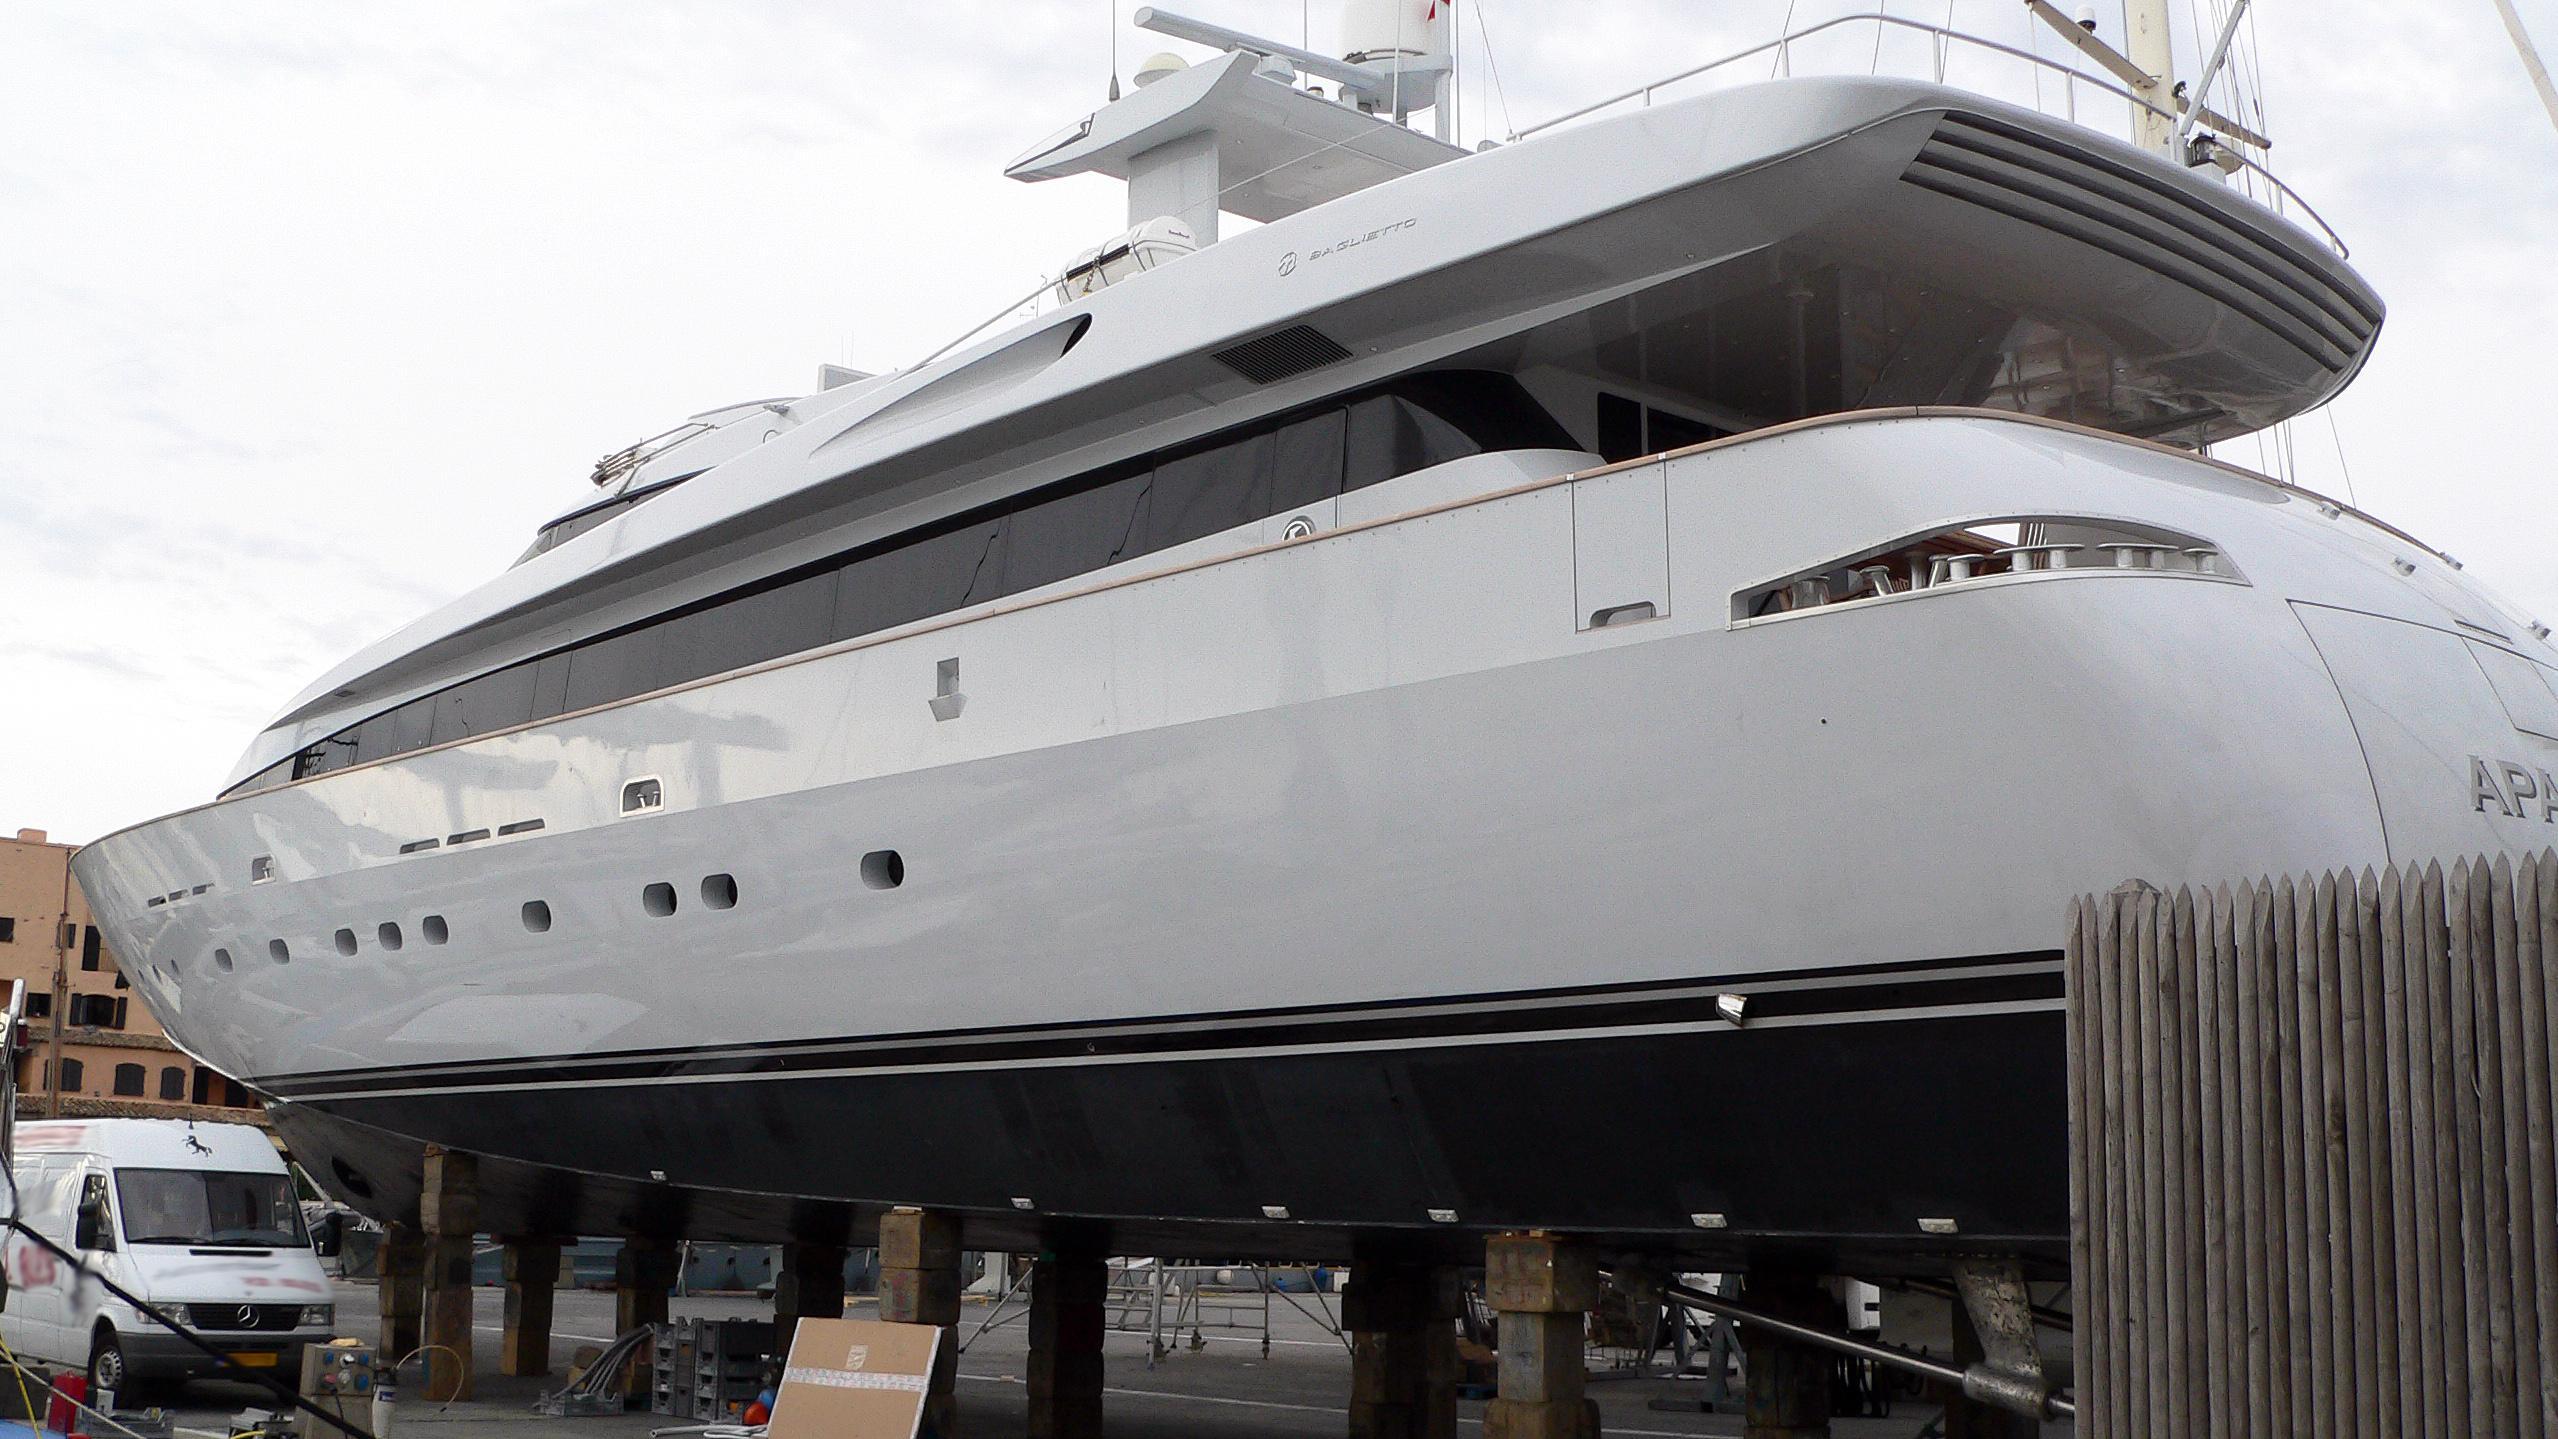 ro-v-an-motor-yacht-baglietto-2003-33m-stern-shipyard